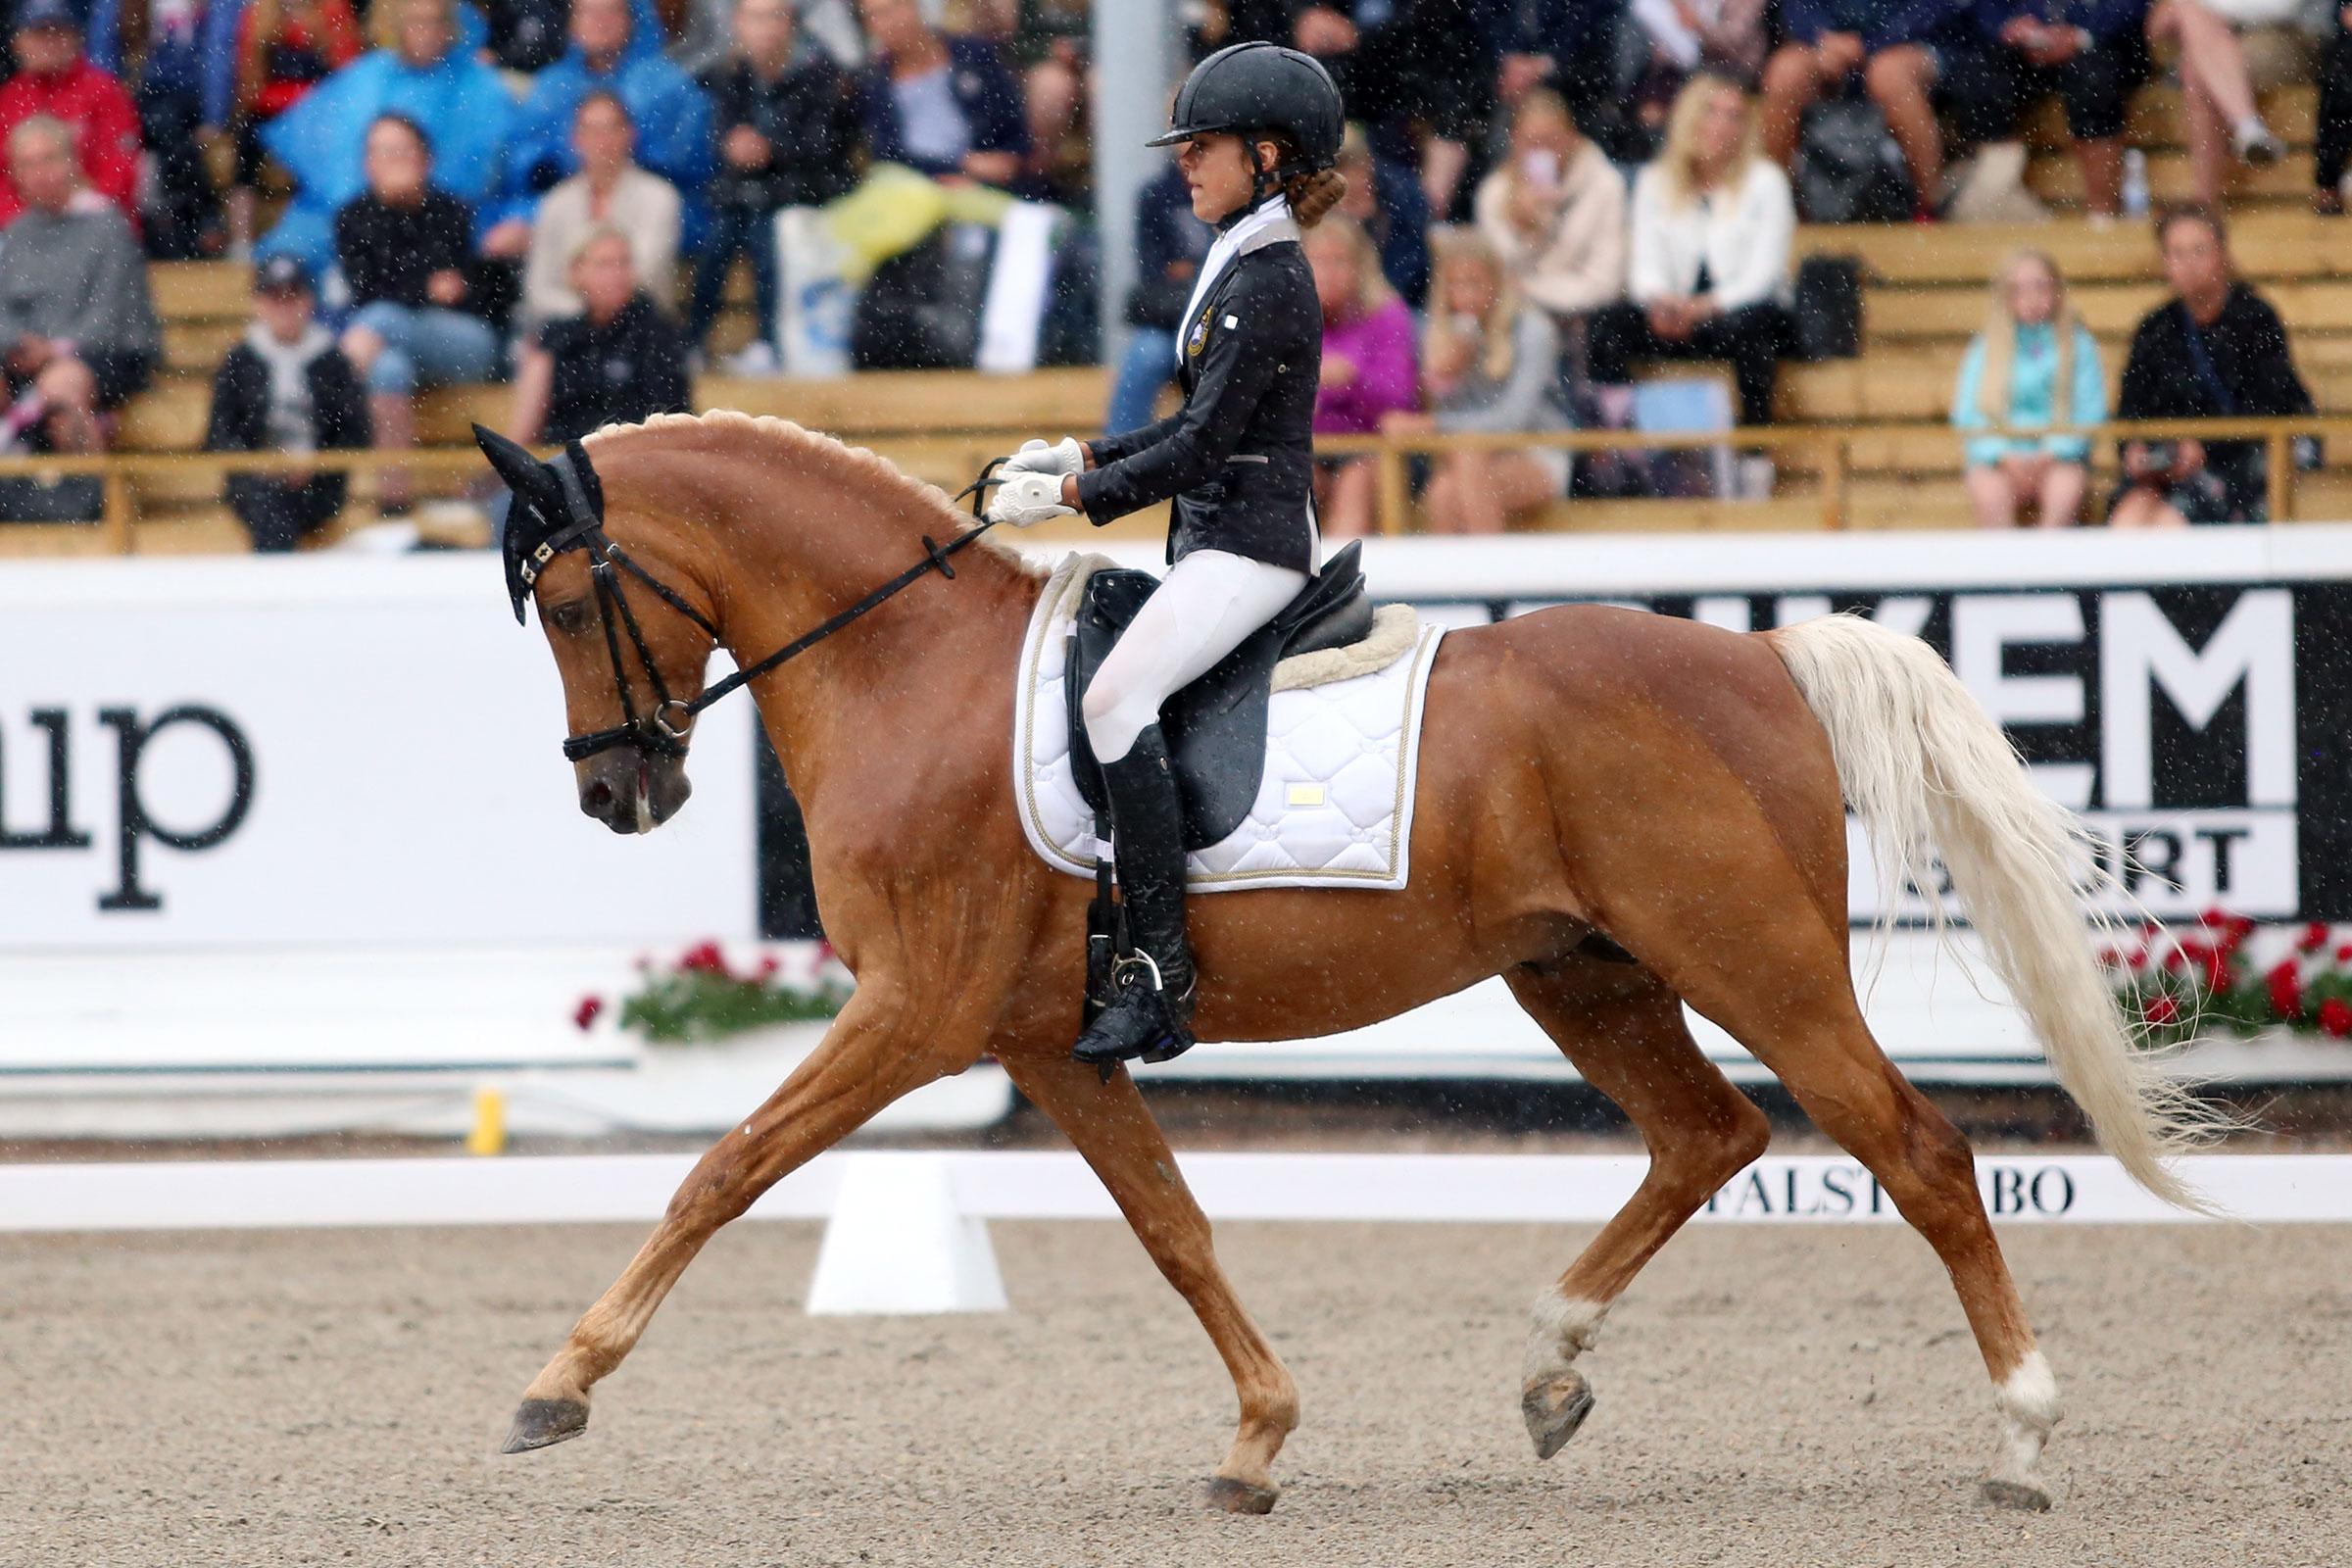 Emilia Berglund Bergåkra - Jarno RP 145 (ASRP hingst f-01 e Coelenhage's Purioso-Coelenhage's Let's be the Best, uppf R. Bonhof) 71,098%